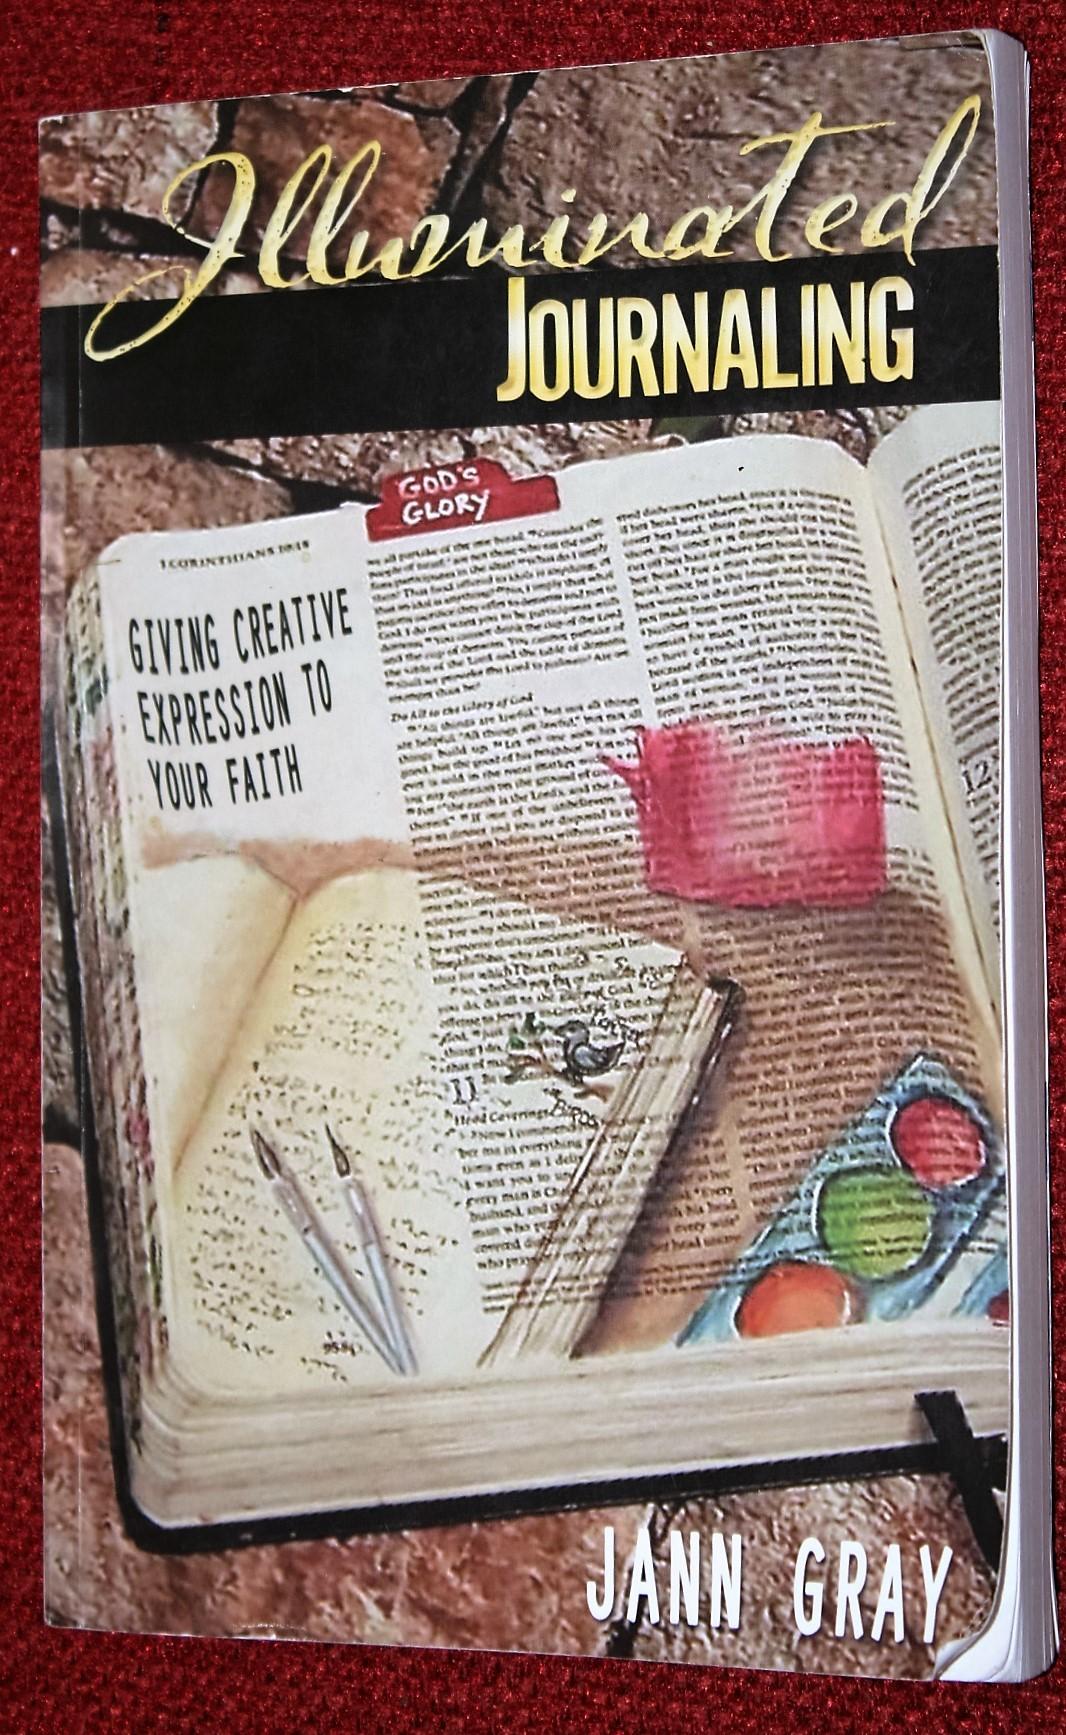 Illuminated Journaling Review Bible Buying Guide